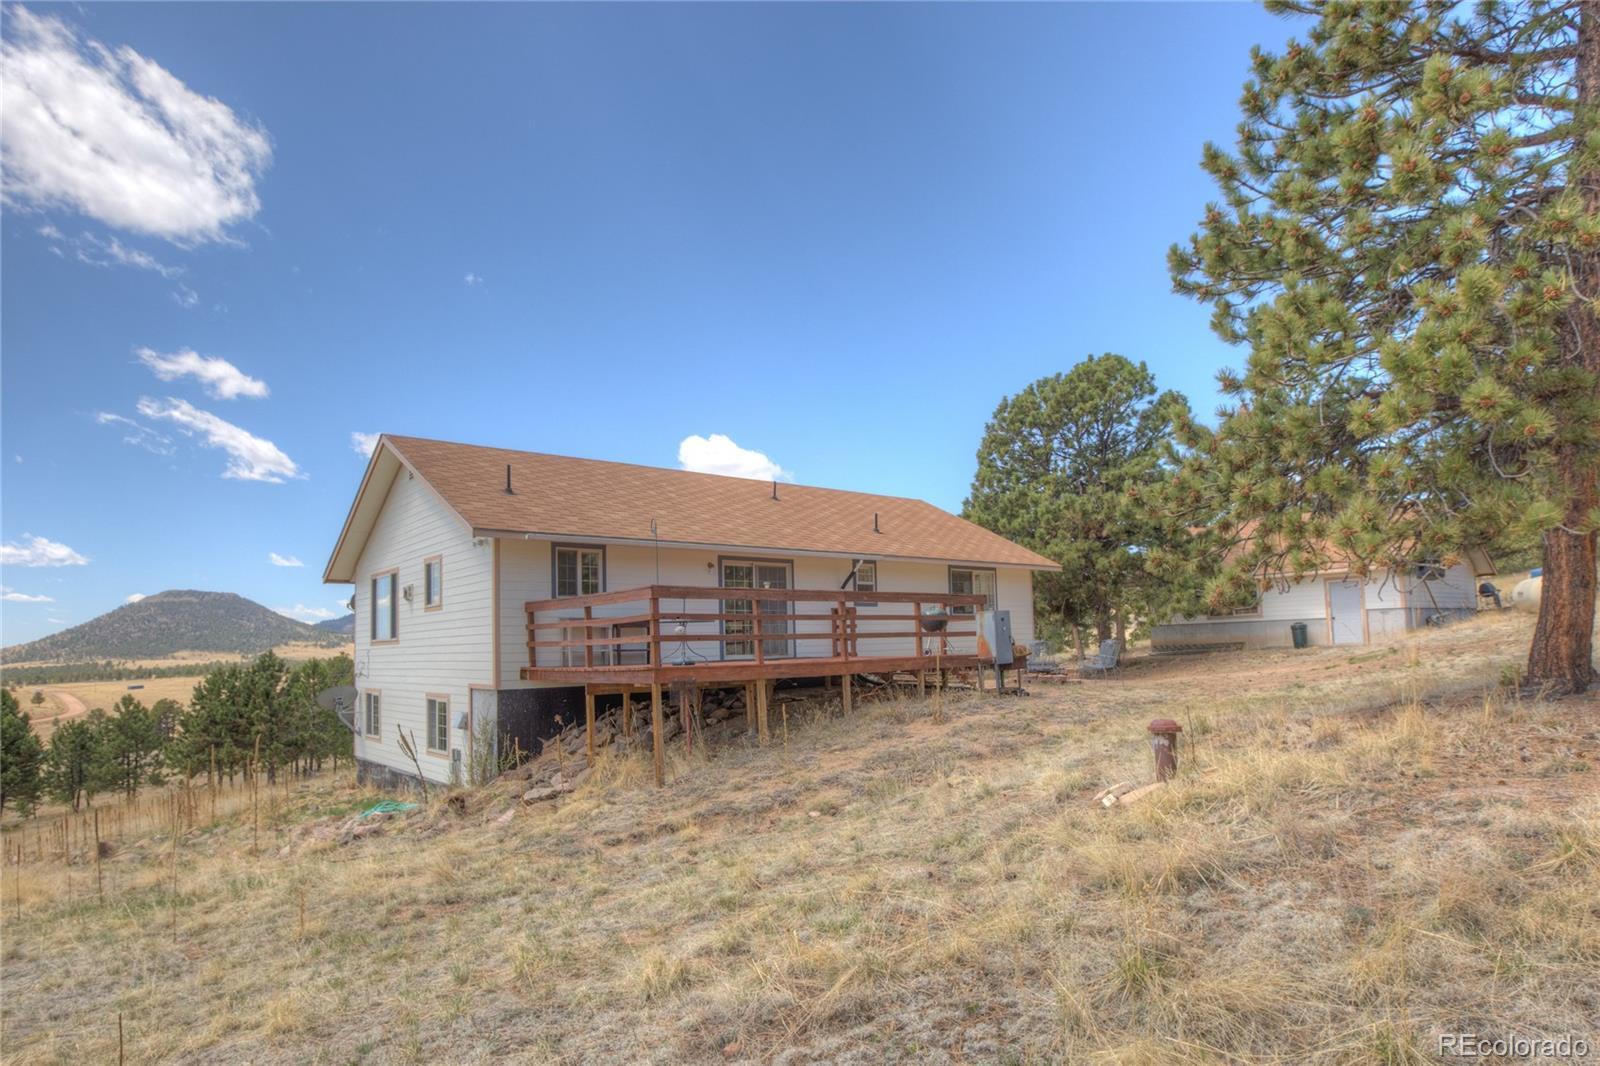 21 Peak Drive, Guffey, CO 80820 - Guffey, CO real estate listing